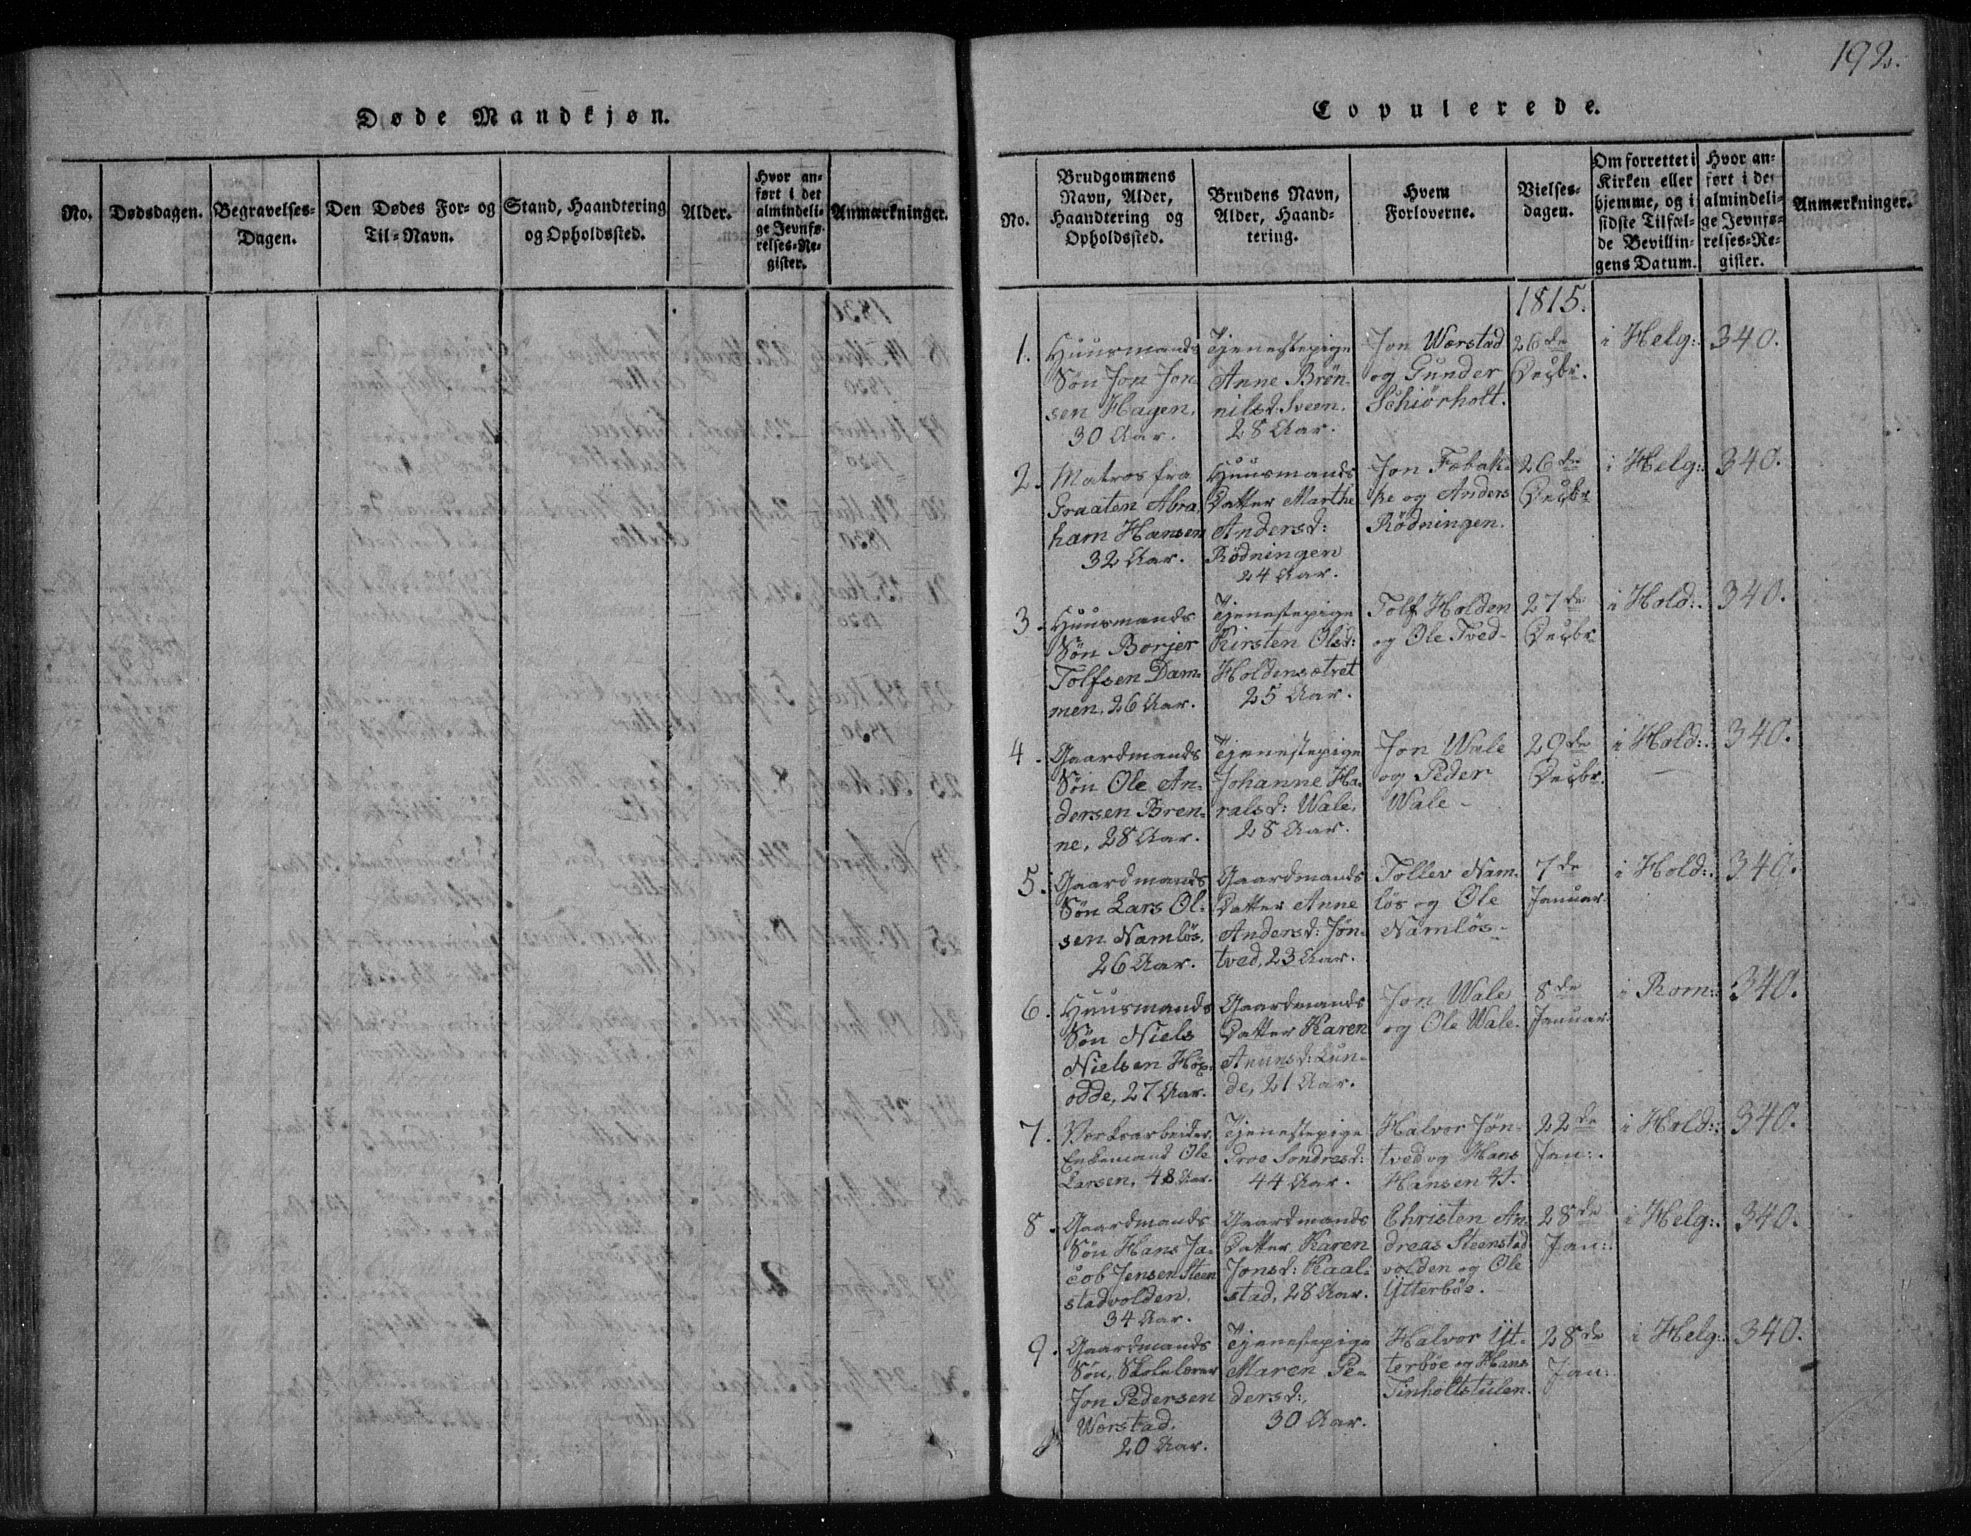 SAKO, Holla kirkebøker, F/Fa/L0003: Ministerialbok nr. 3, 1815-1830, s. 192